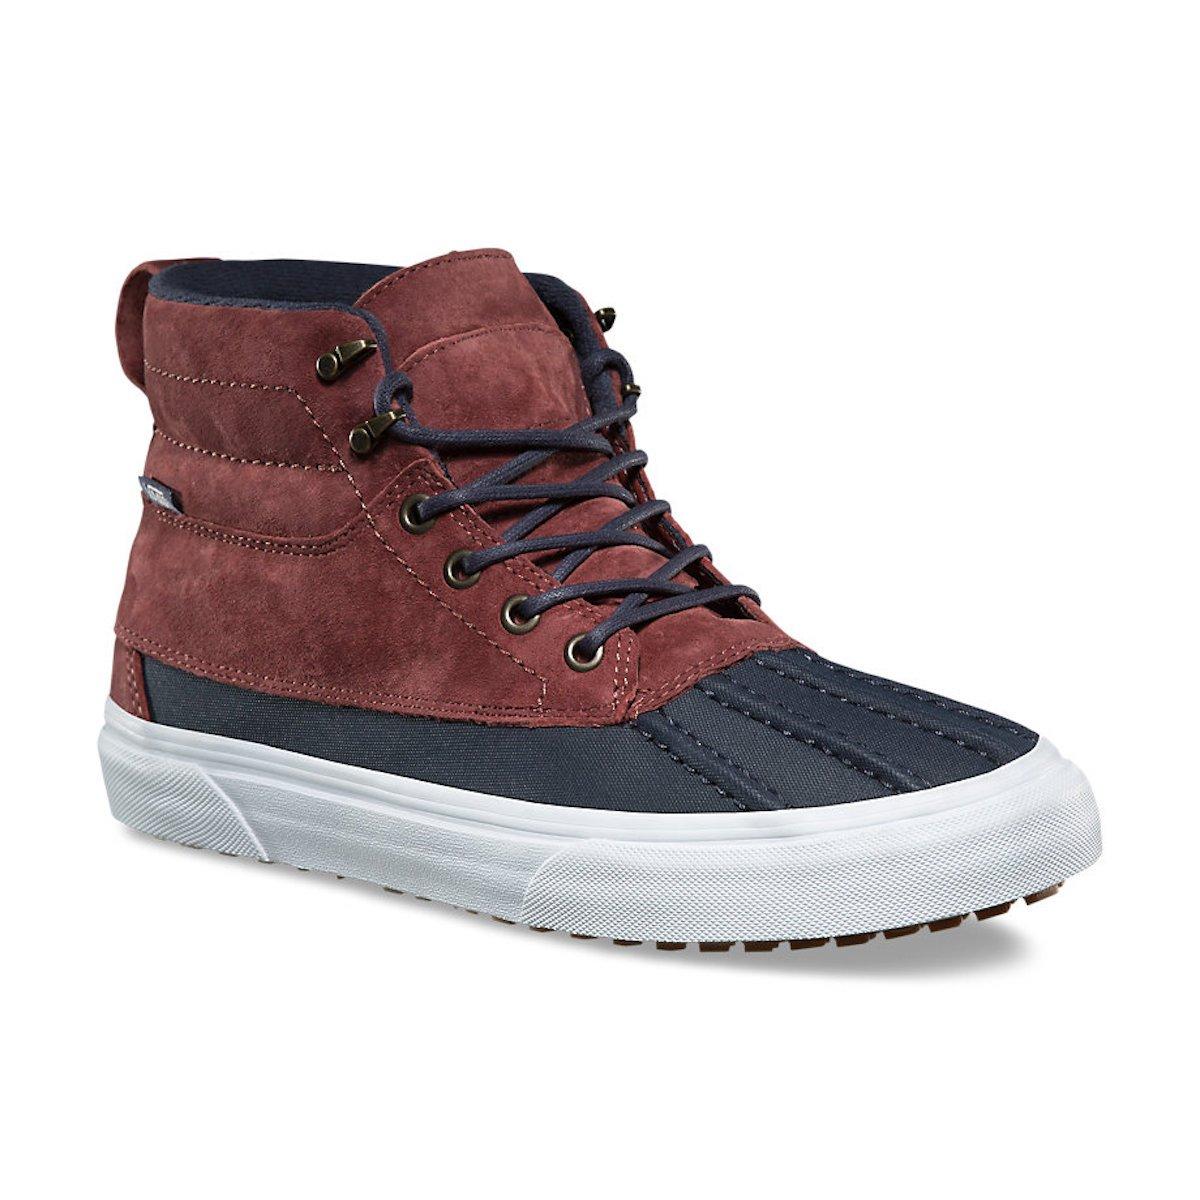 Vans Men's Sk8 Hi Del Pato Skateboarding Shoes (10 B(M) US Women / 8.5 D(M) US Men, SABLE/PARISIAN NIGHT)